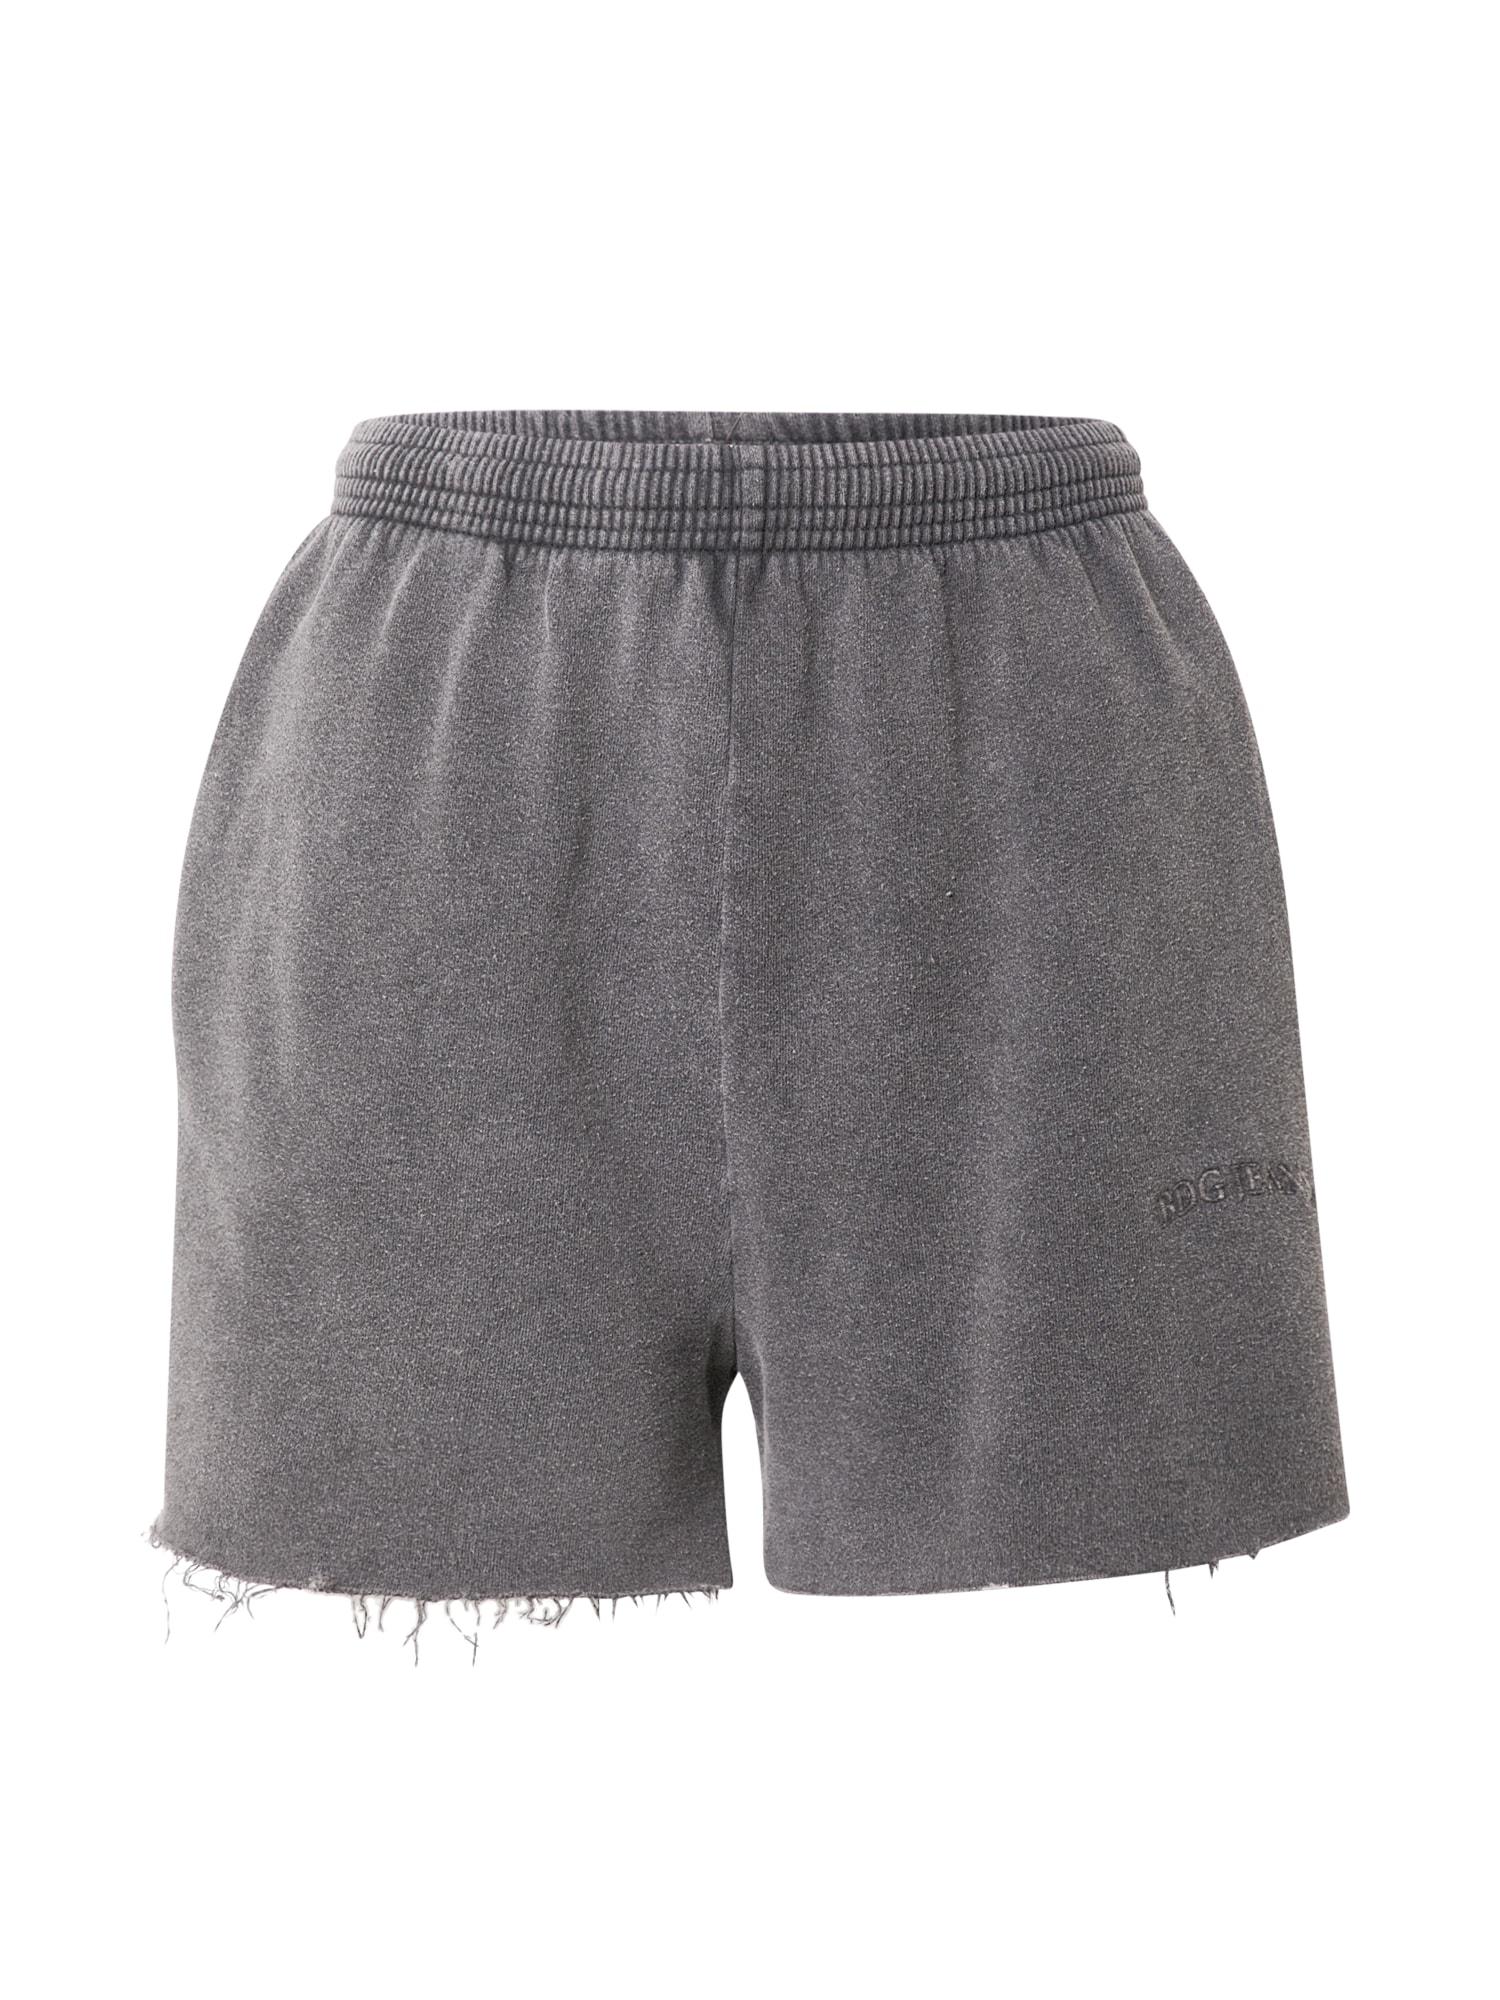 BDG Urban Outfitters Kelnės tamsiai pilka